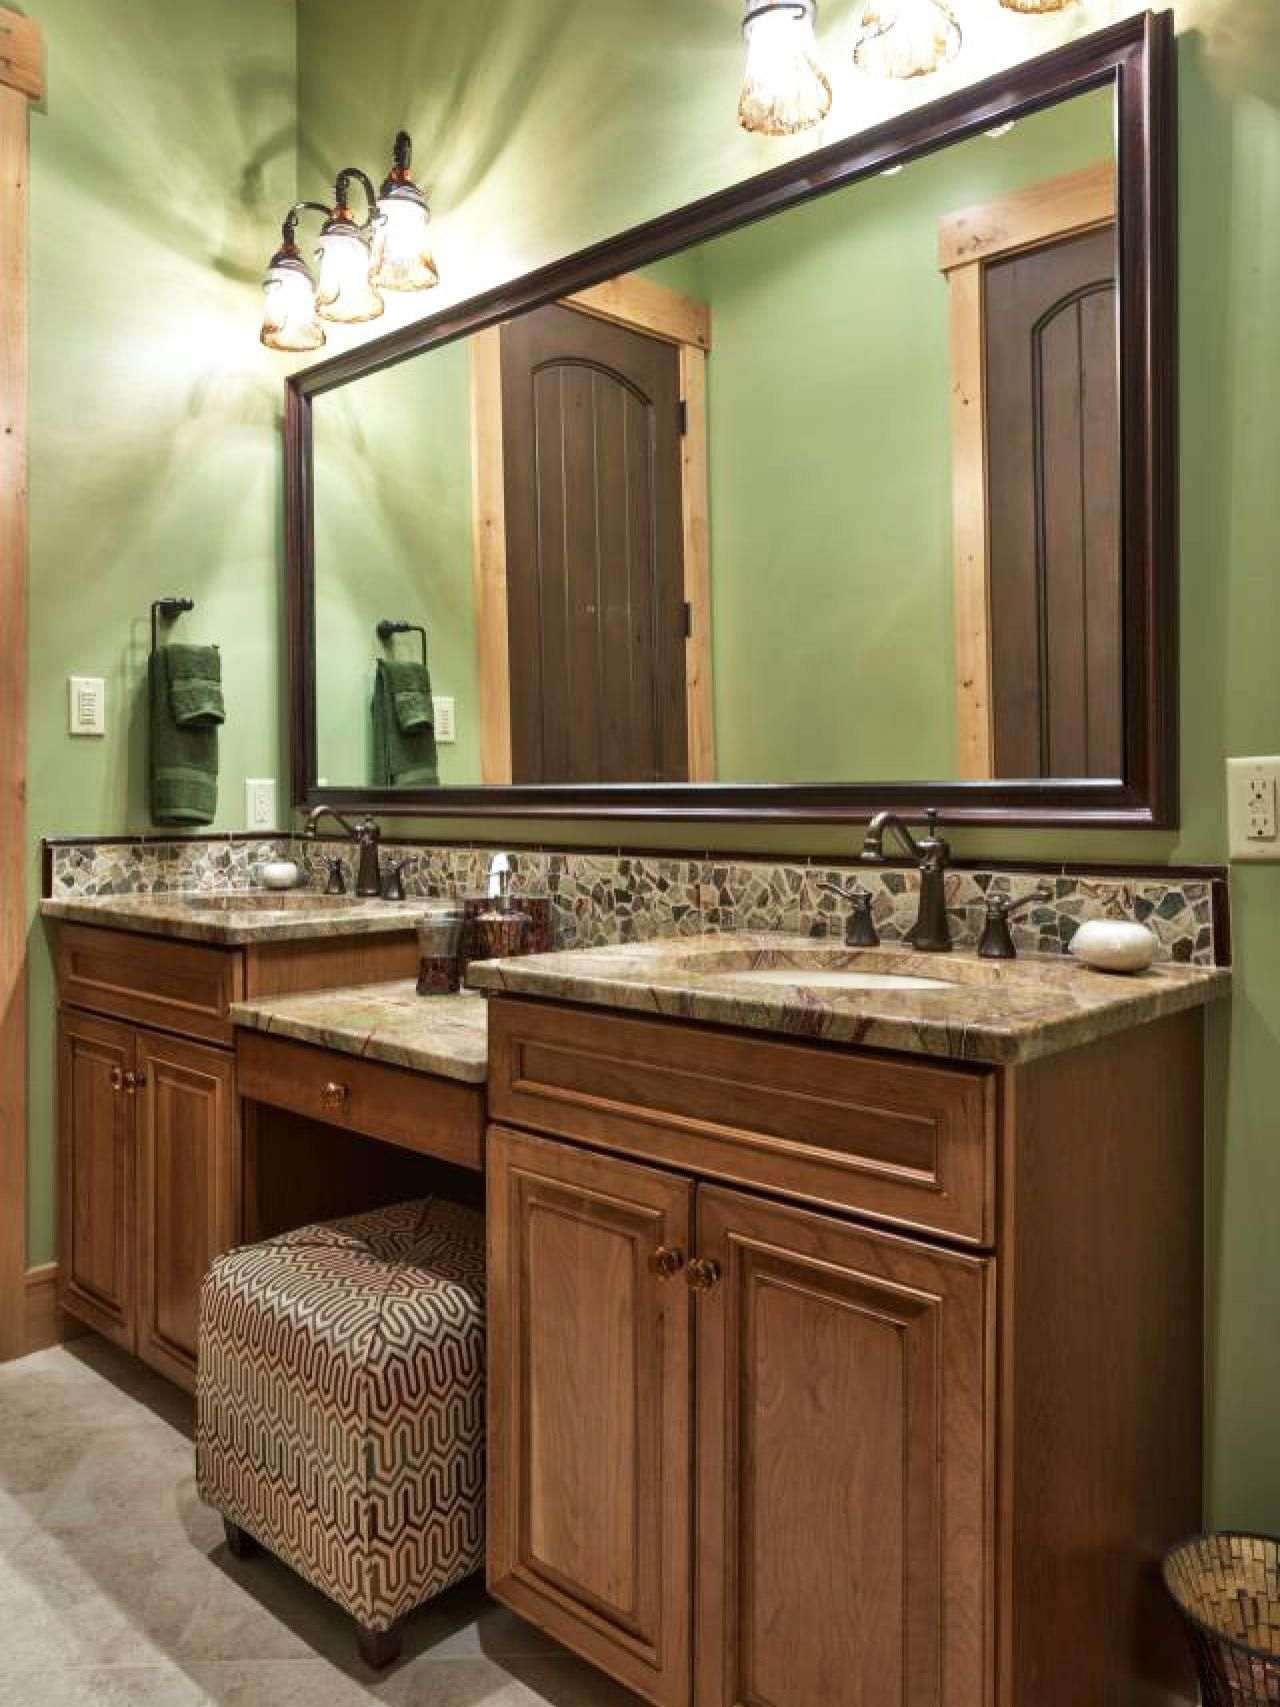 Dark Bathroom Cabinets Design, Pictures, Remodel, Decor And Ideas  Page 3   Design  Pinterest  Dark Bathrooms, Cabinet Design And Bathroom Cabinets